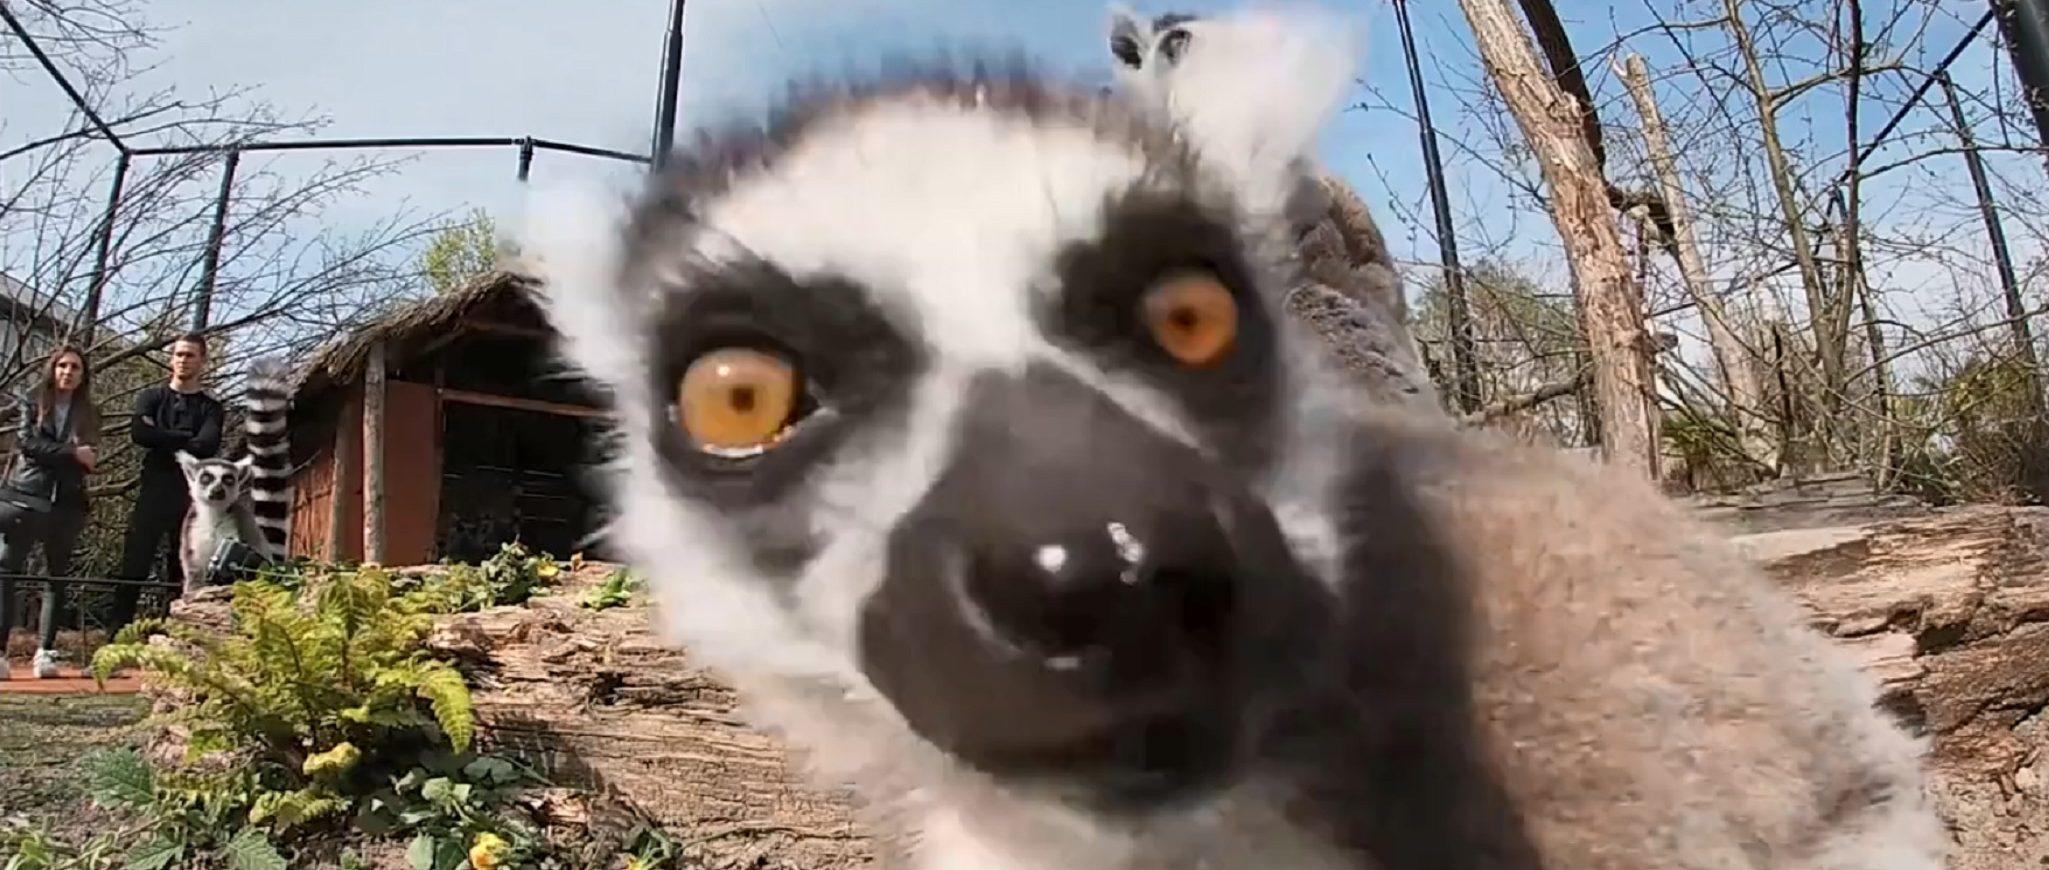 lemur looks curious at you